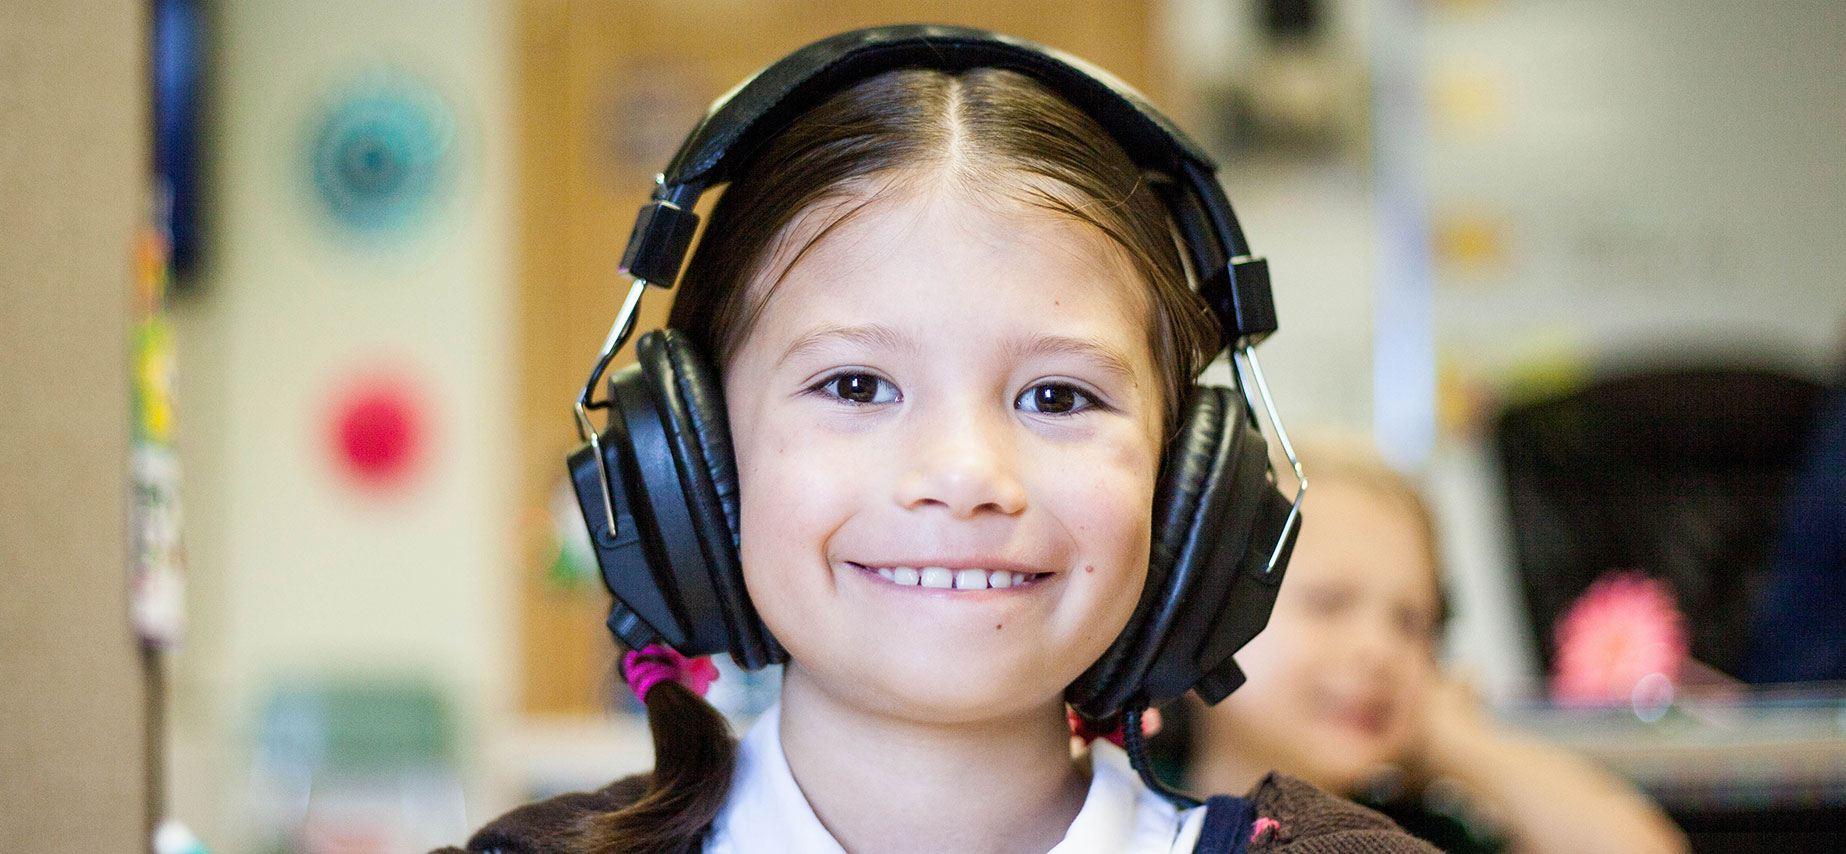 oral-health-help-kids